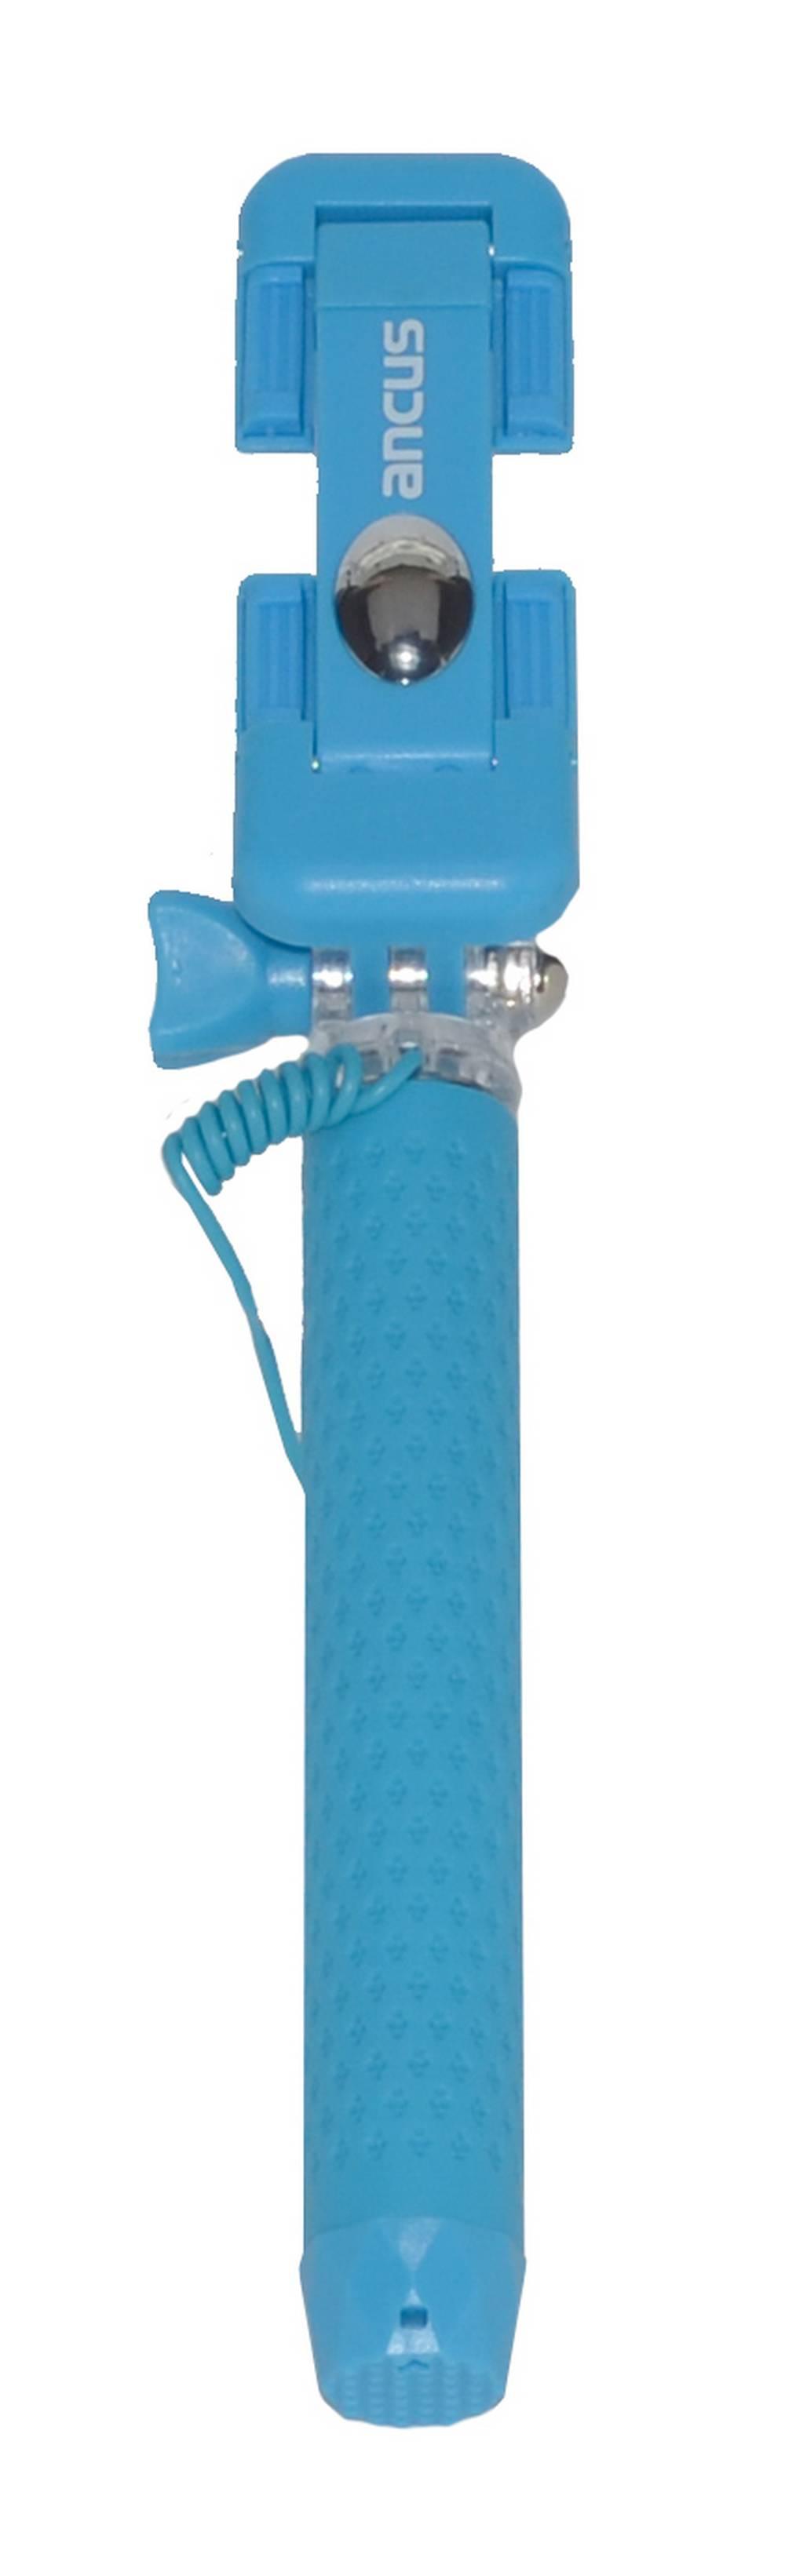 Selfie Stick Ancus Colour Μπλε με Καλώδιο Jack 3.5mm (Μήκος Κονταριού 13.5cm, Μήκος Ανοίγματος 65cm)